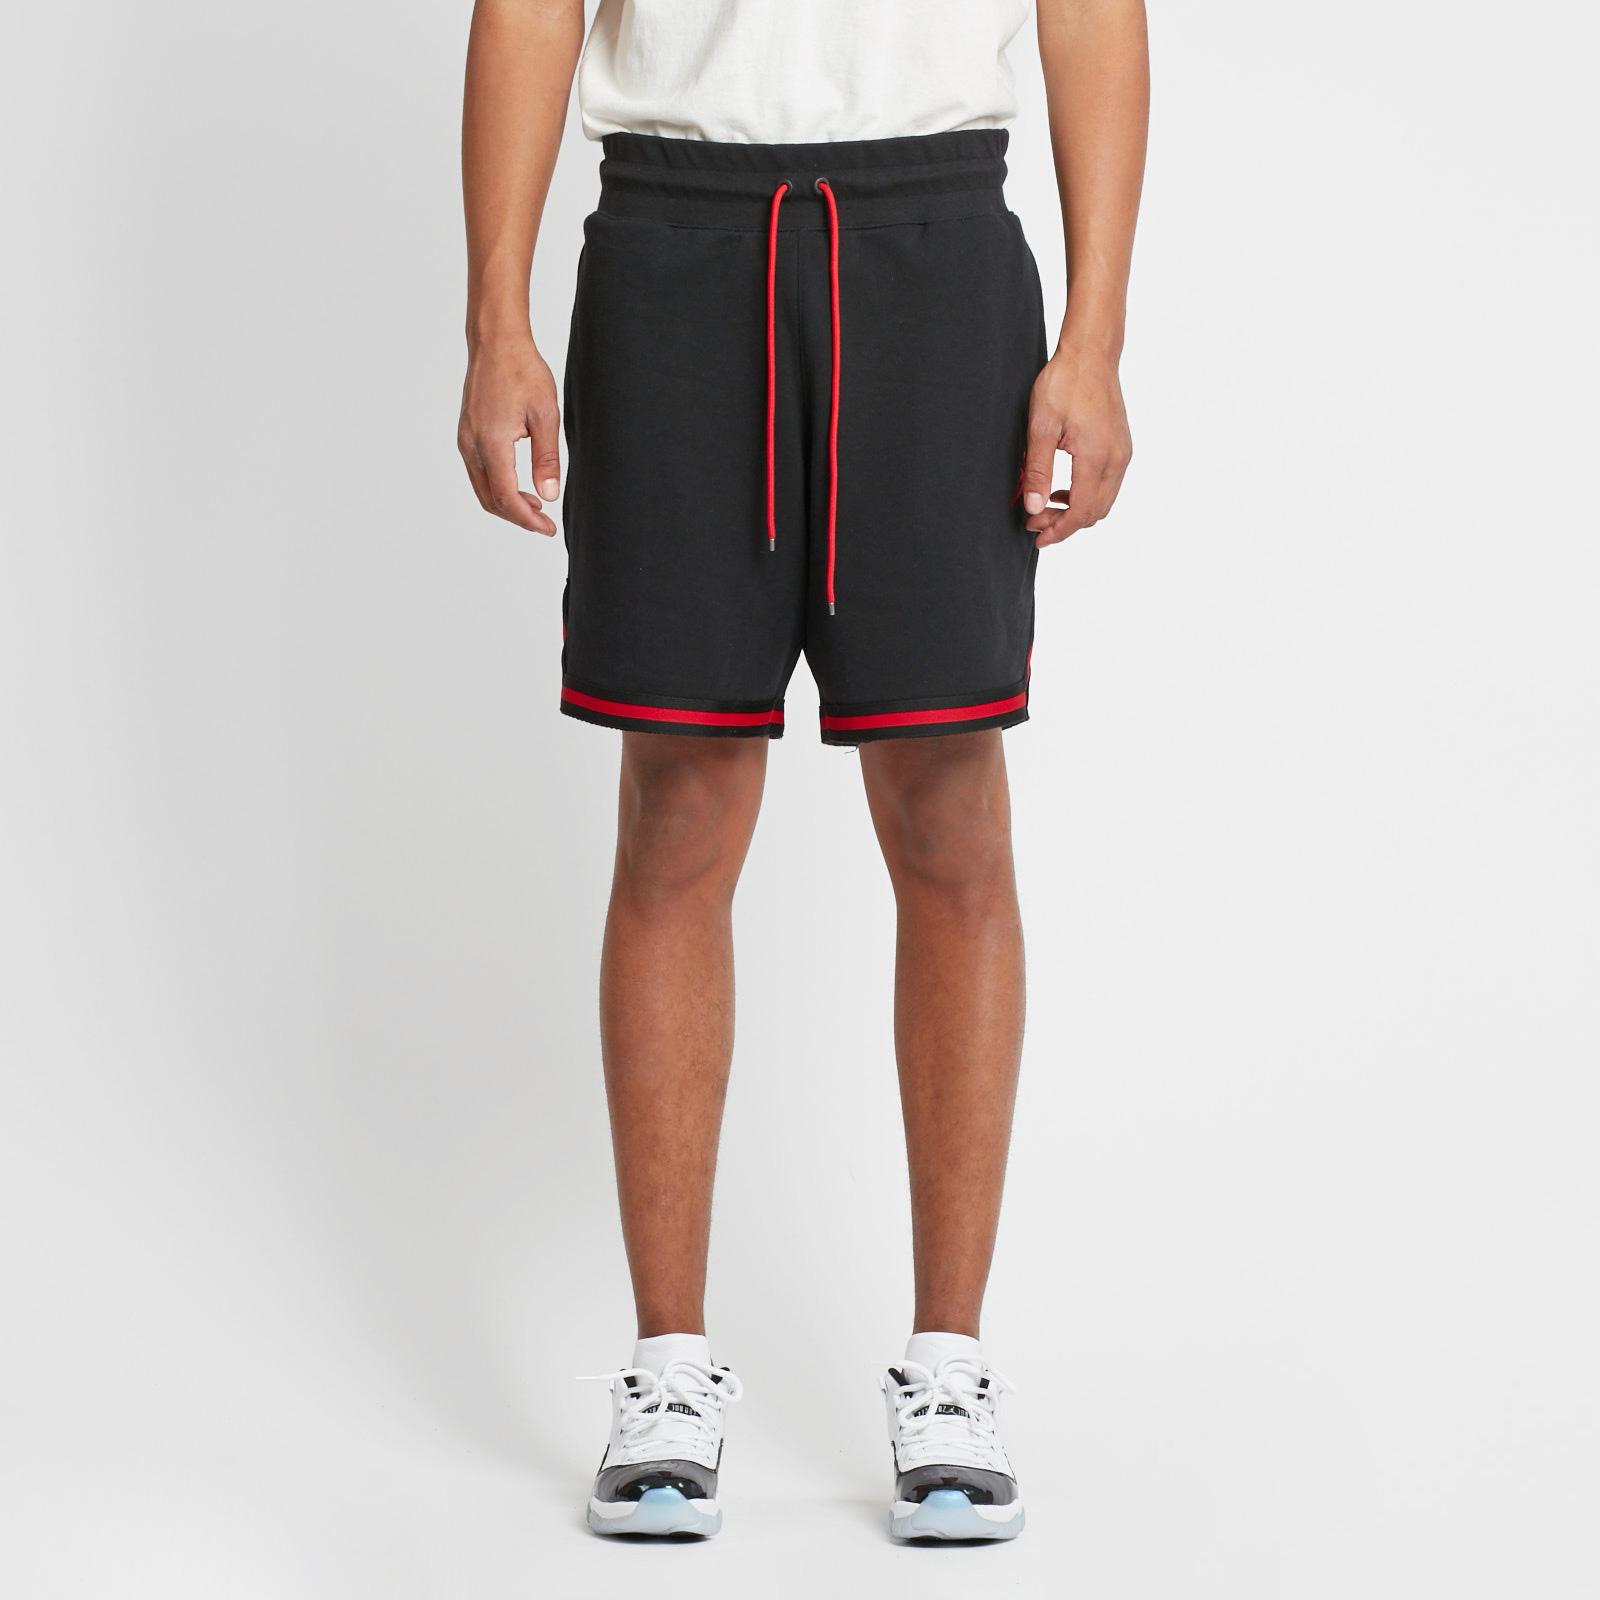 cb9fd8cd560 Jordan Brand Wings Lite 1988 Fleece Shorts - Aj0438-010 ...